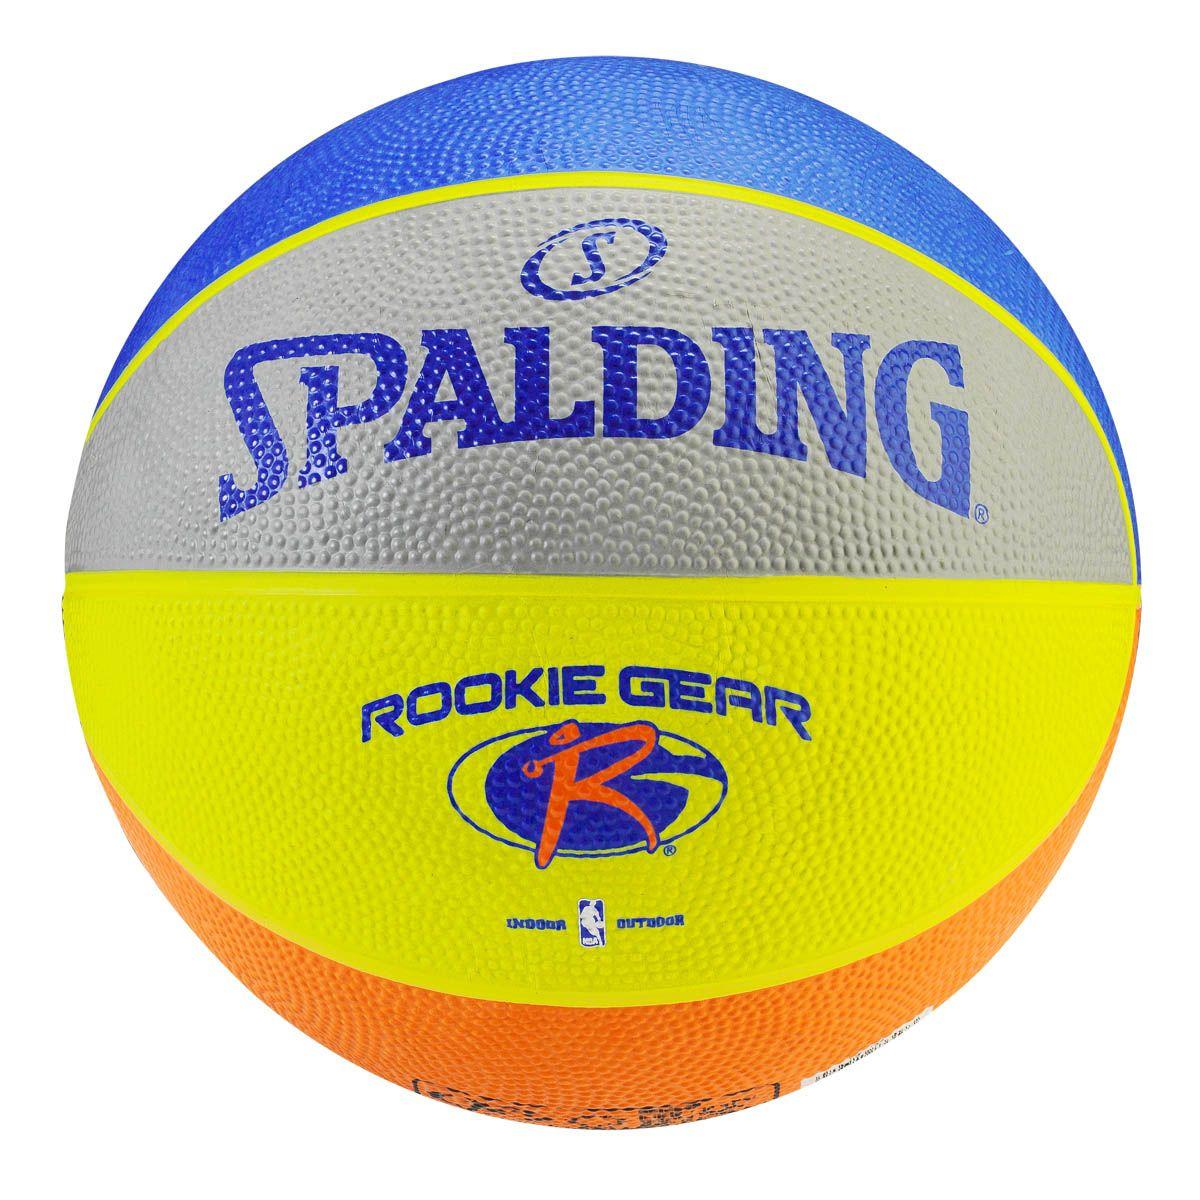 Spalding Rookie Gear Outdoor Basketball